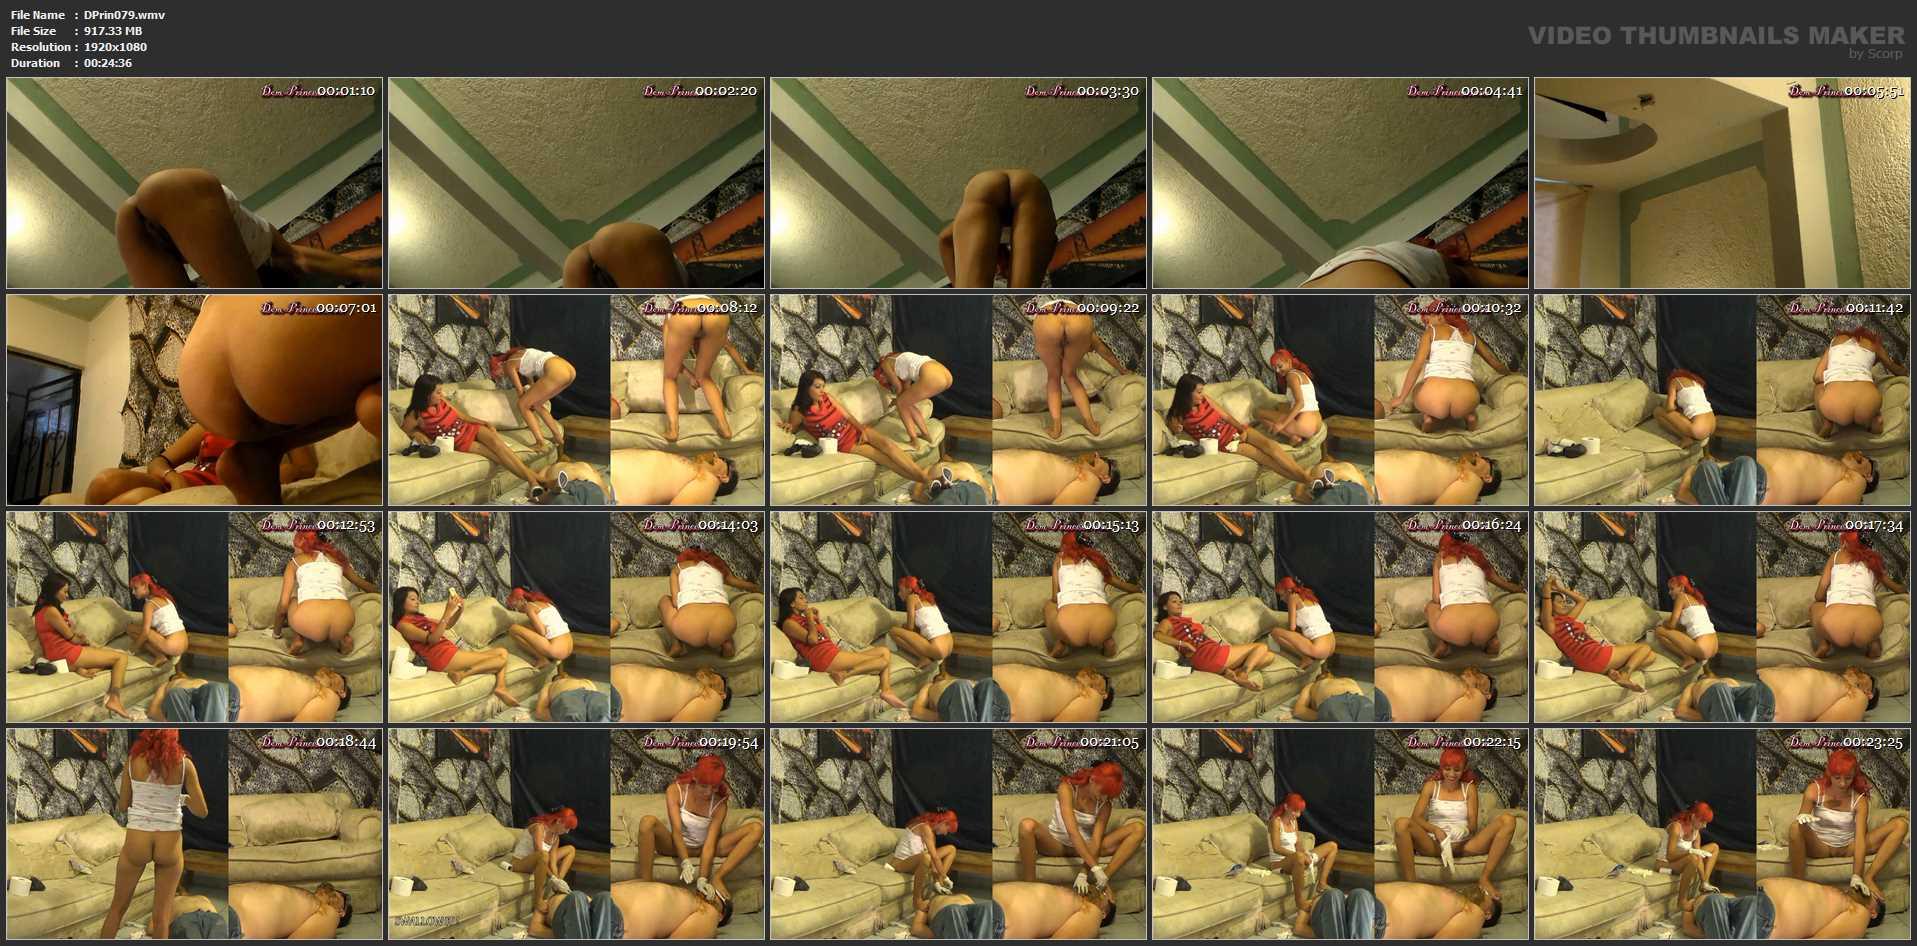 [DOM-PRINCESS] Toilet Slave has Surprised Visit Part 2 Inka [FULL HD][1080p][WMV]